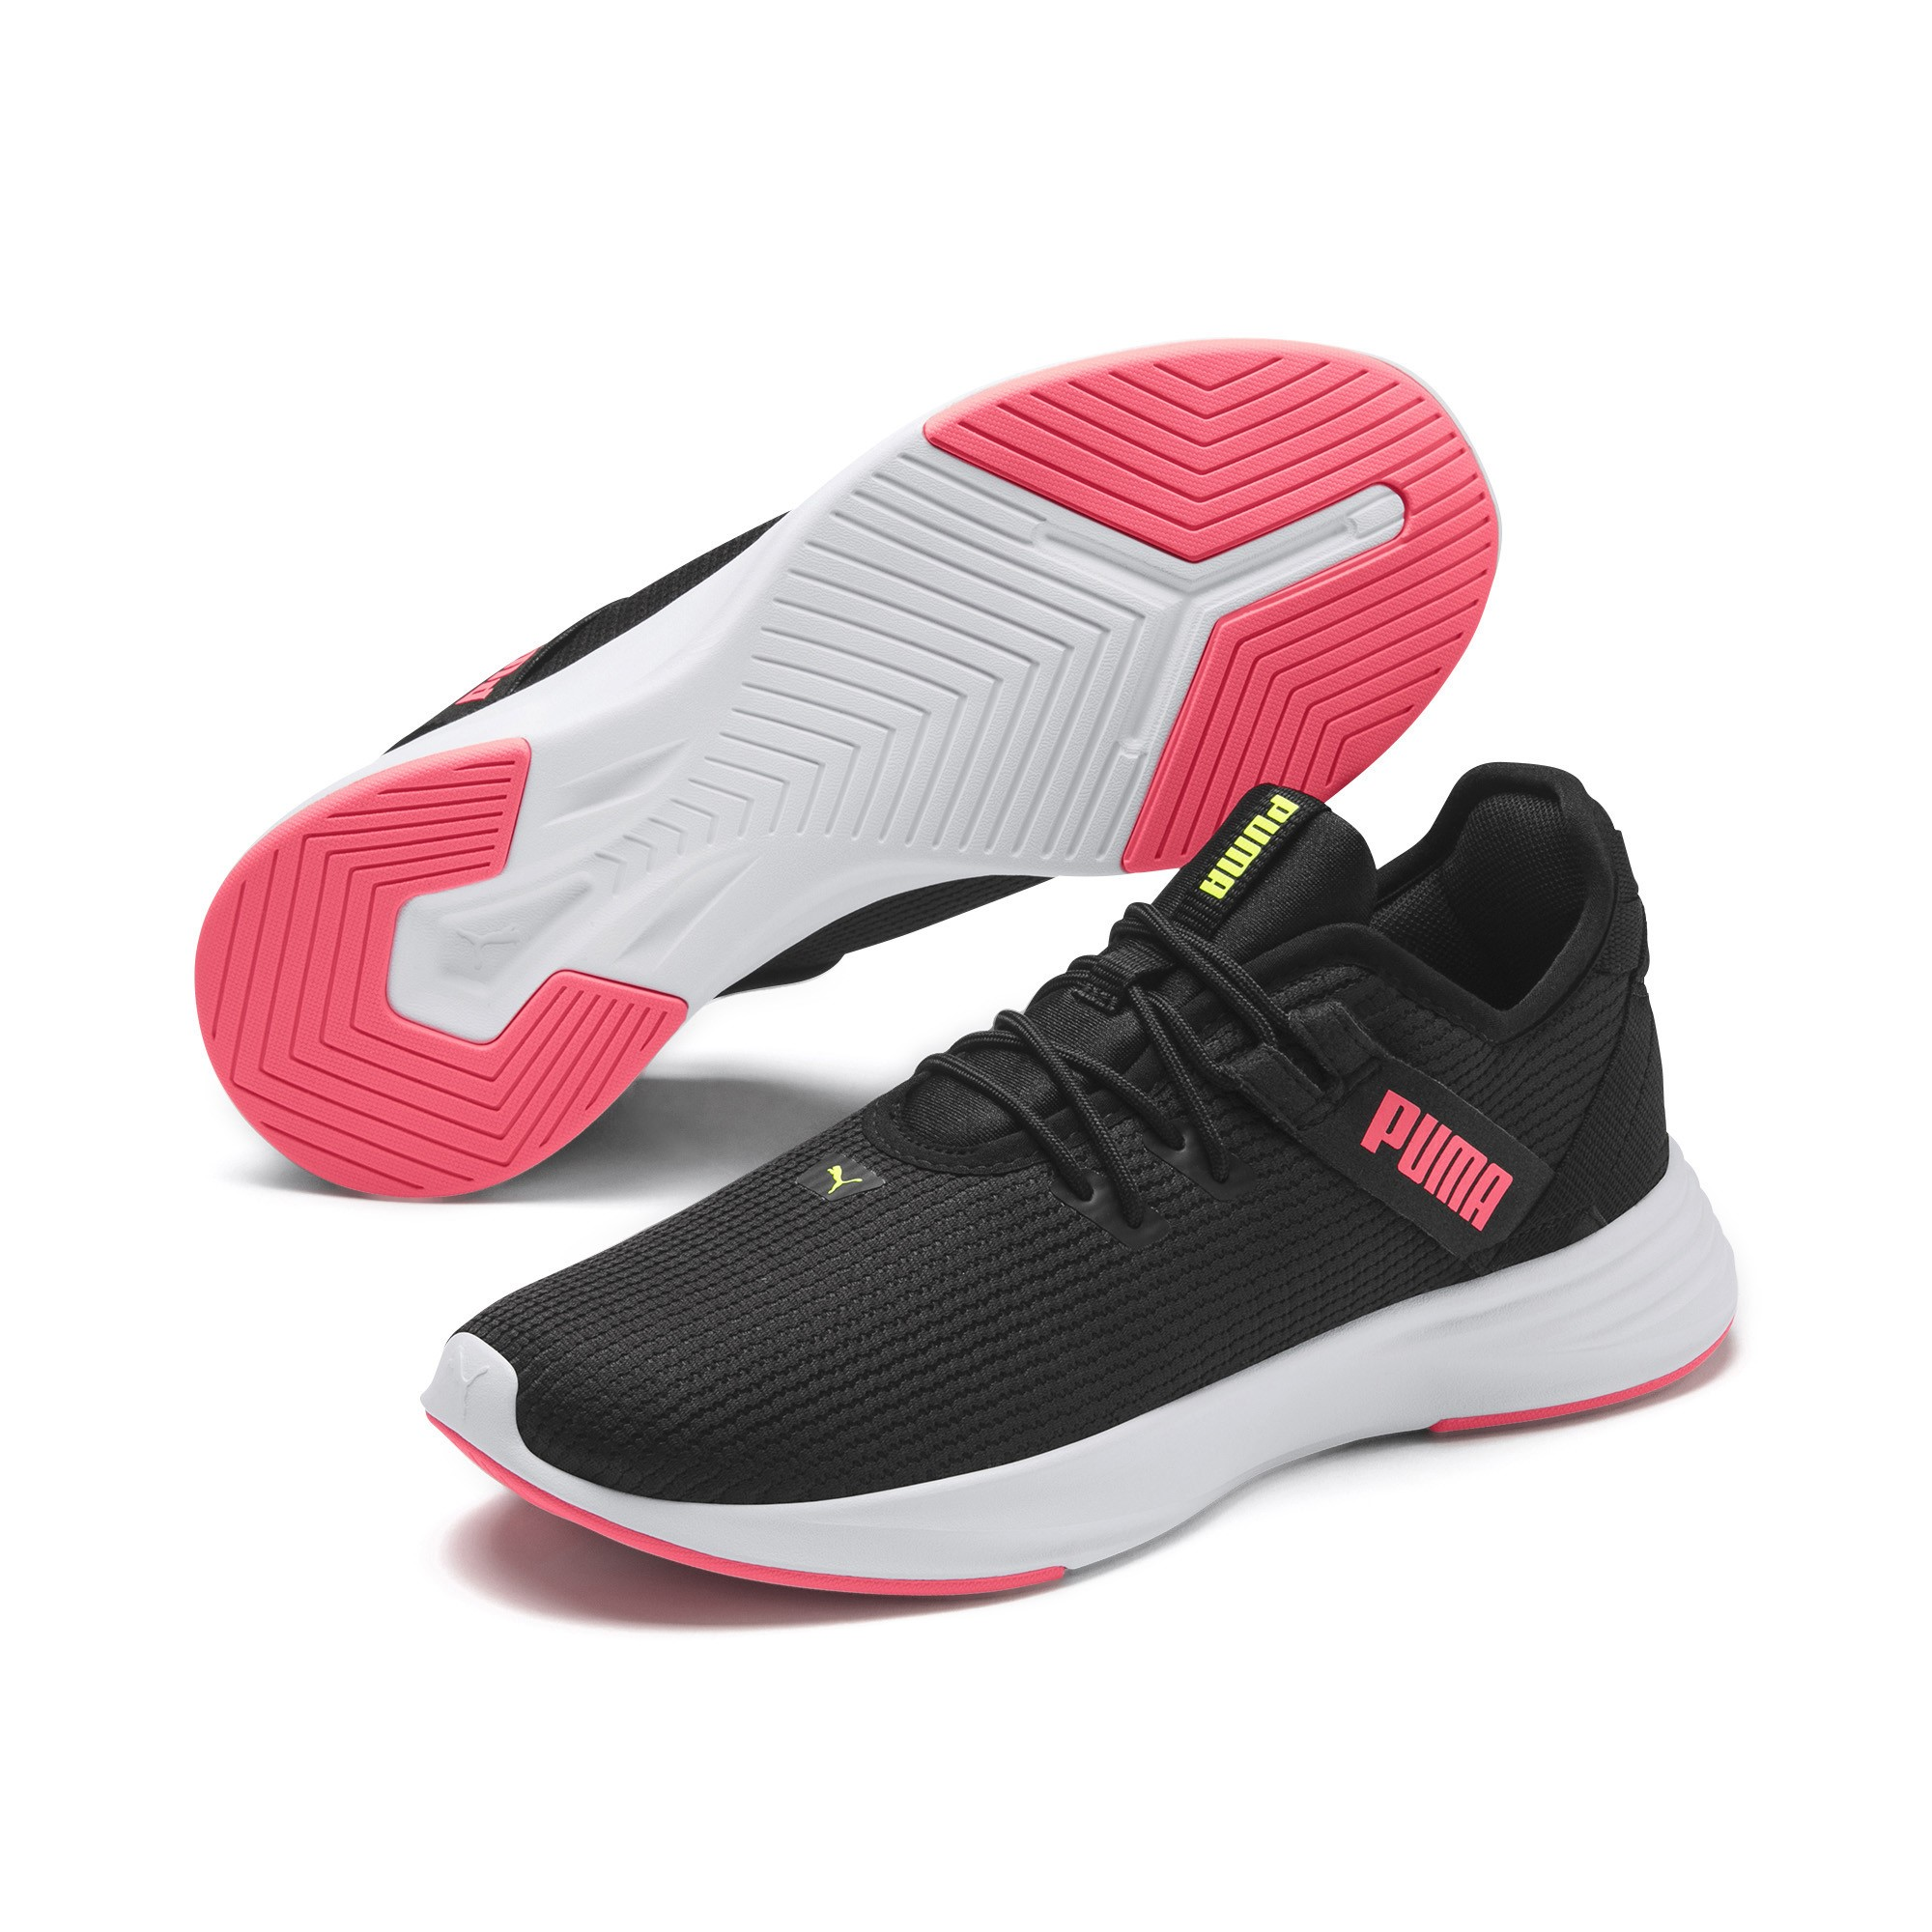 PUMA Radiate XT Women's Training Shoes